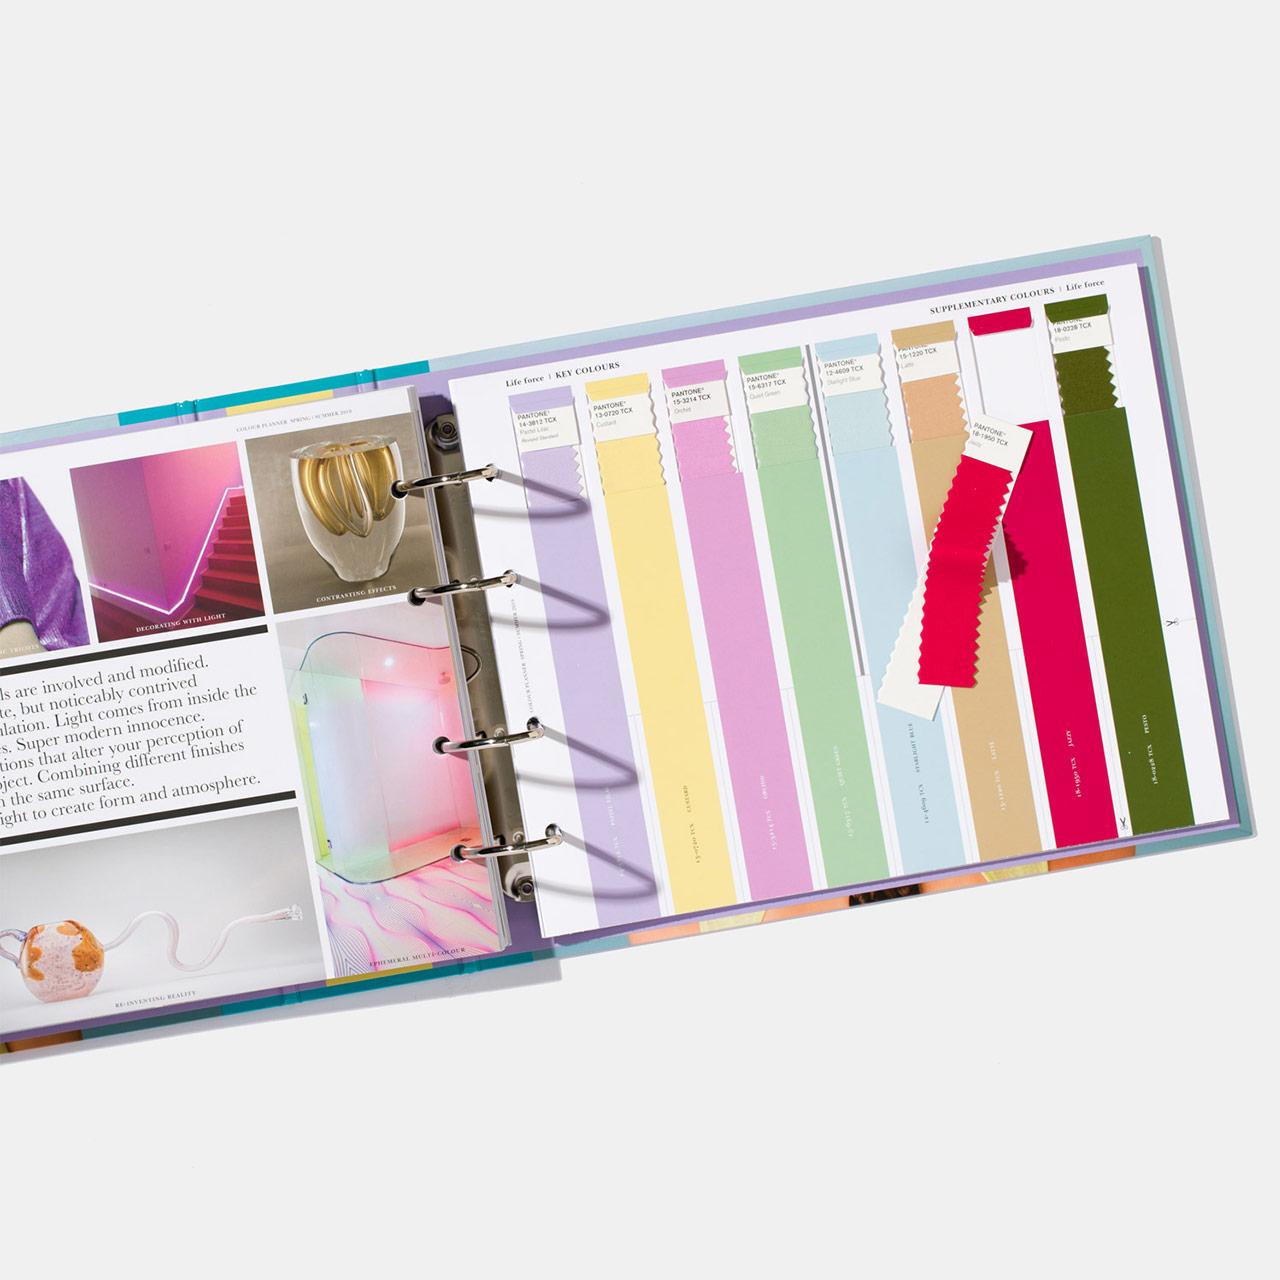 Pantone Home And Interiors 2017 Pantoneview Colour Planner Primavera Ver 227 O 2019 Pantone